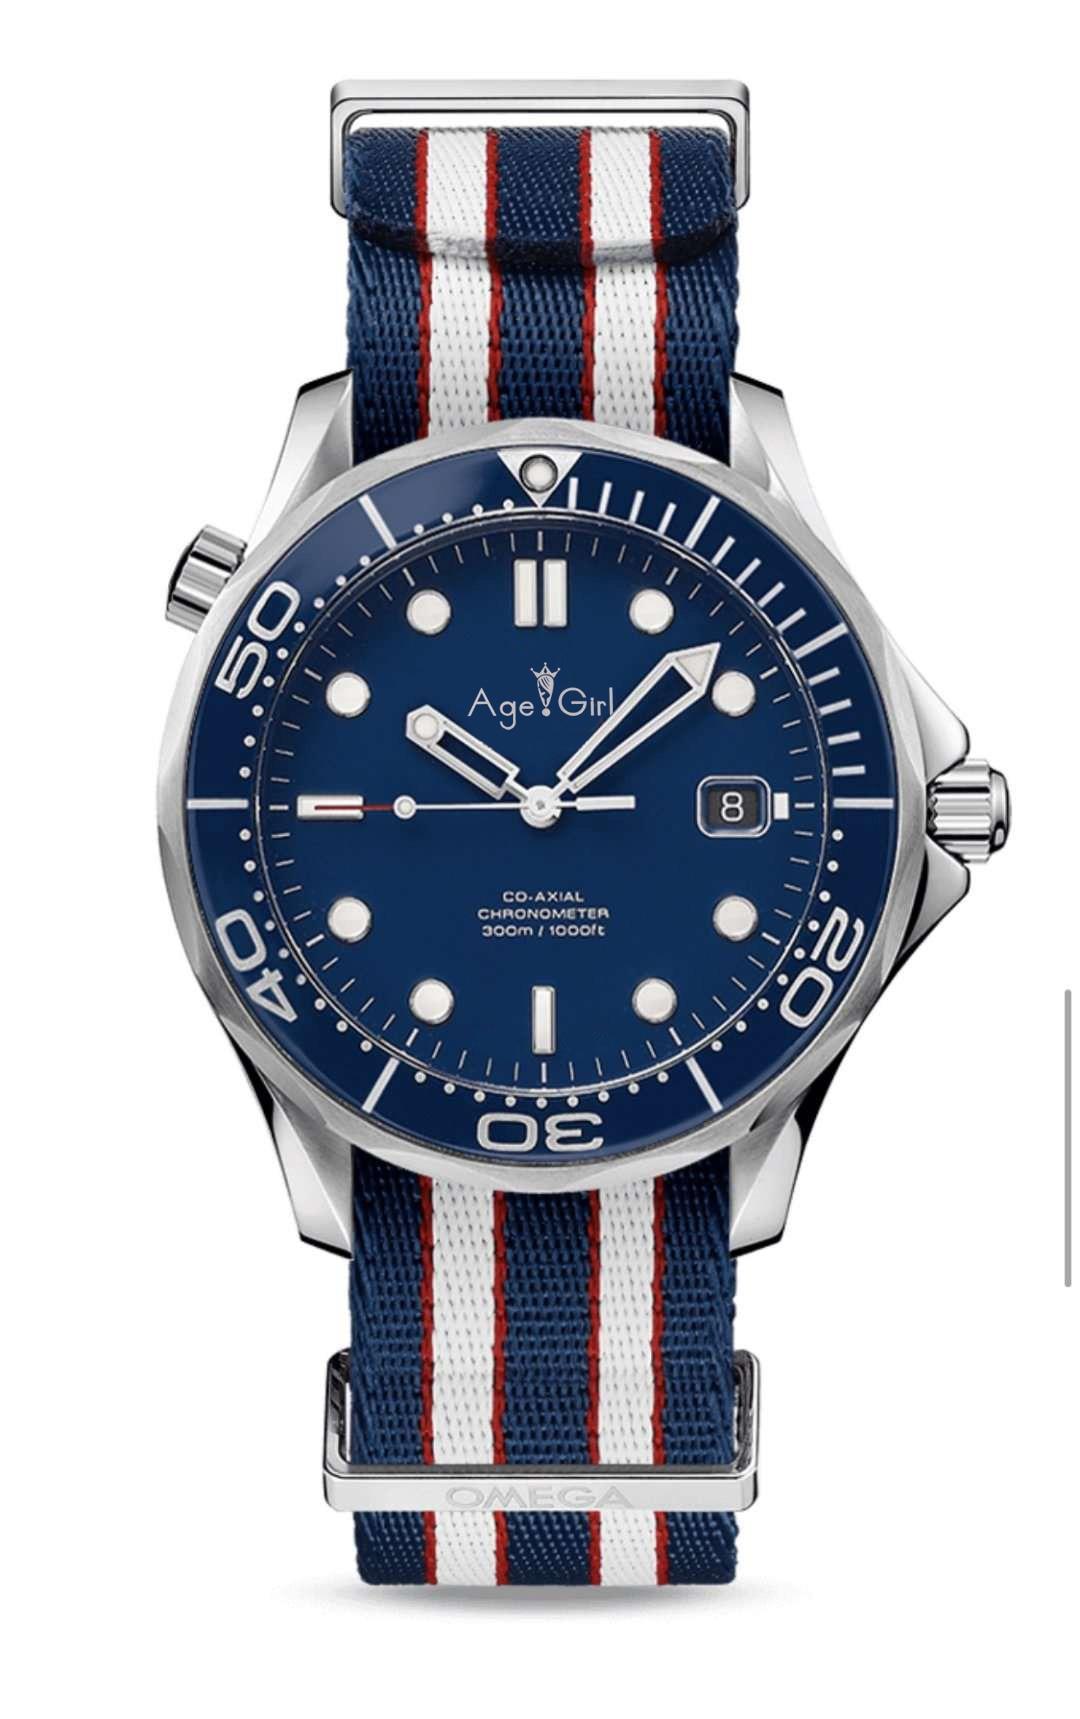 Здесь можно купить  Luxury Brand New Men Automatic Mechanical Watch Canvas Blue Red Black James Bond 007 Ceramic Bezel Crystal Sapphire Sport AAA+  Часы